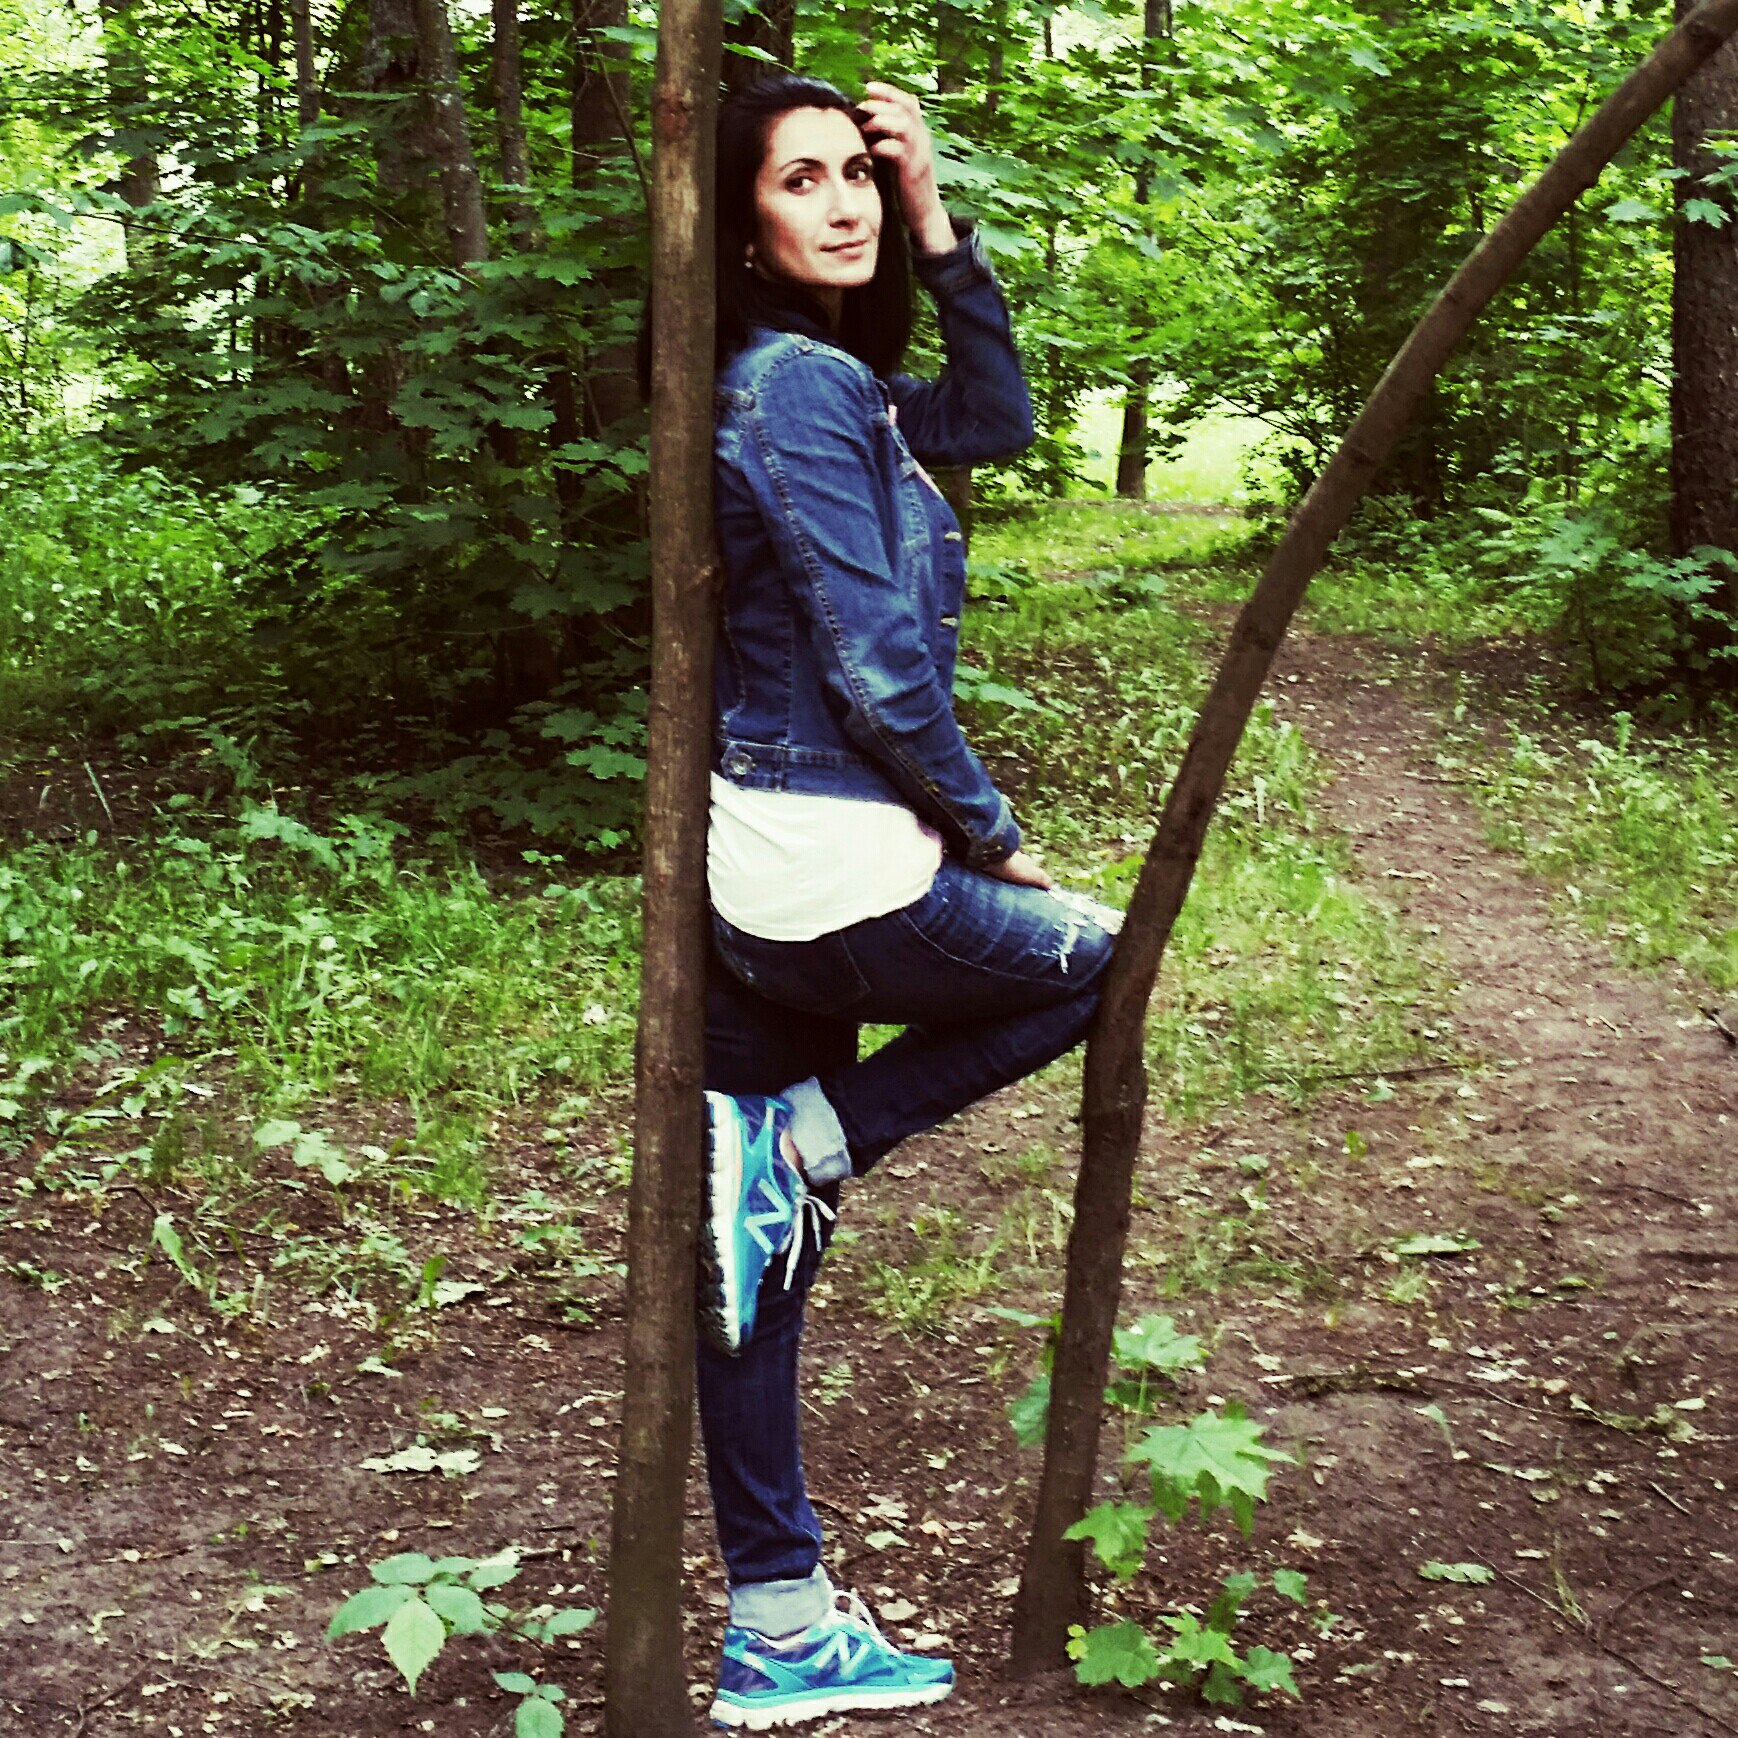 tgp Nature girl